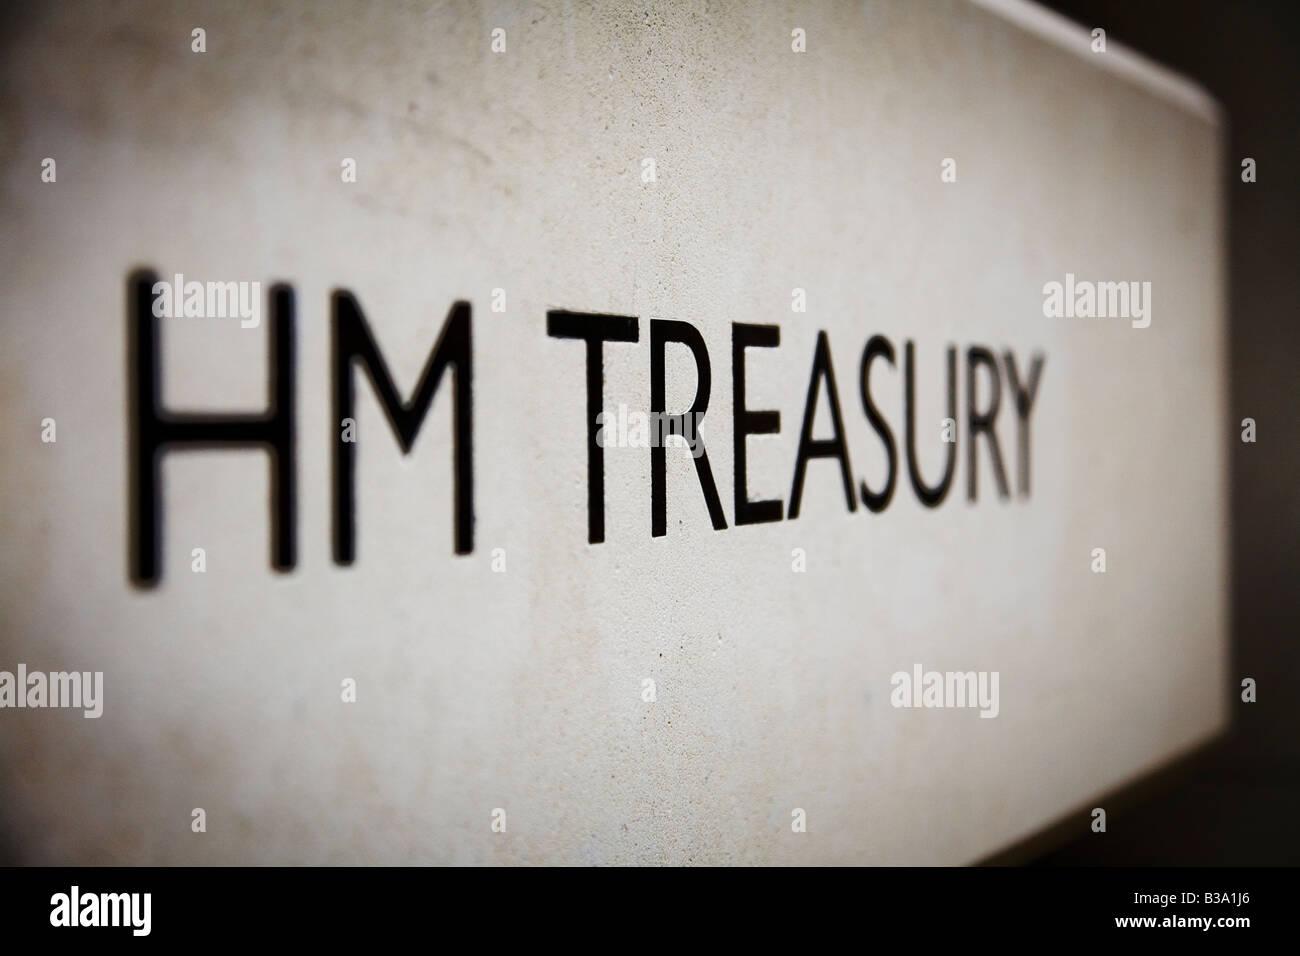 HM Treasury government building entrance Whitehall London UK - Stock Image